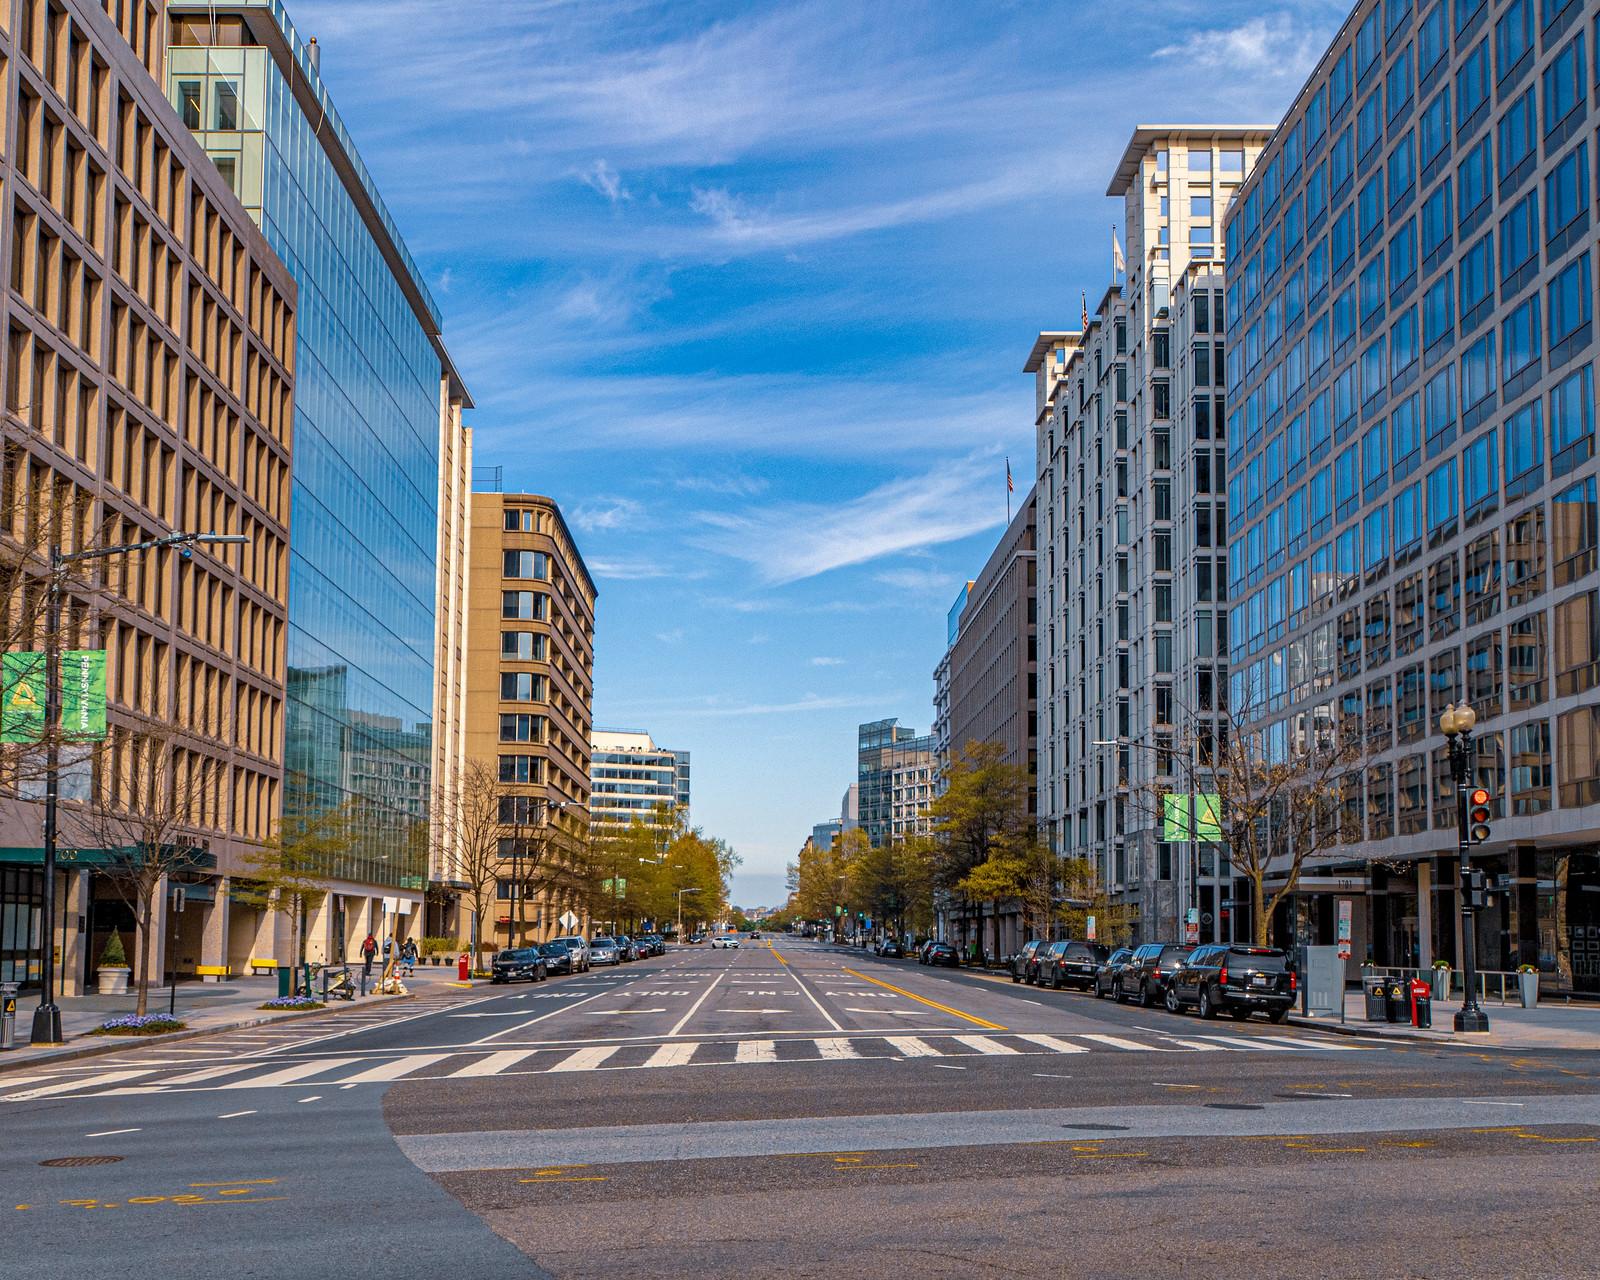 2020.04.07 DC People and Places, Washington, DC USA096 14202